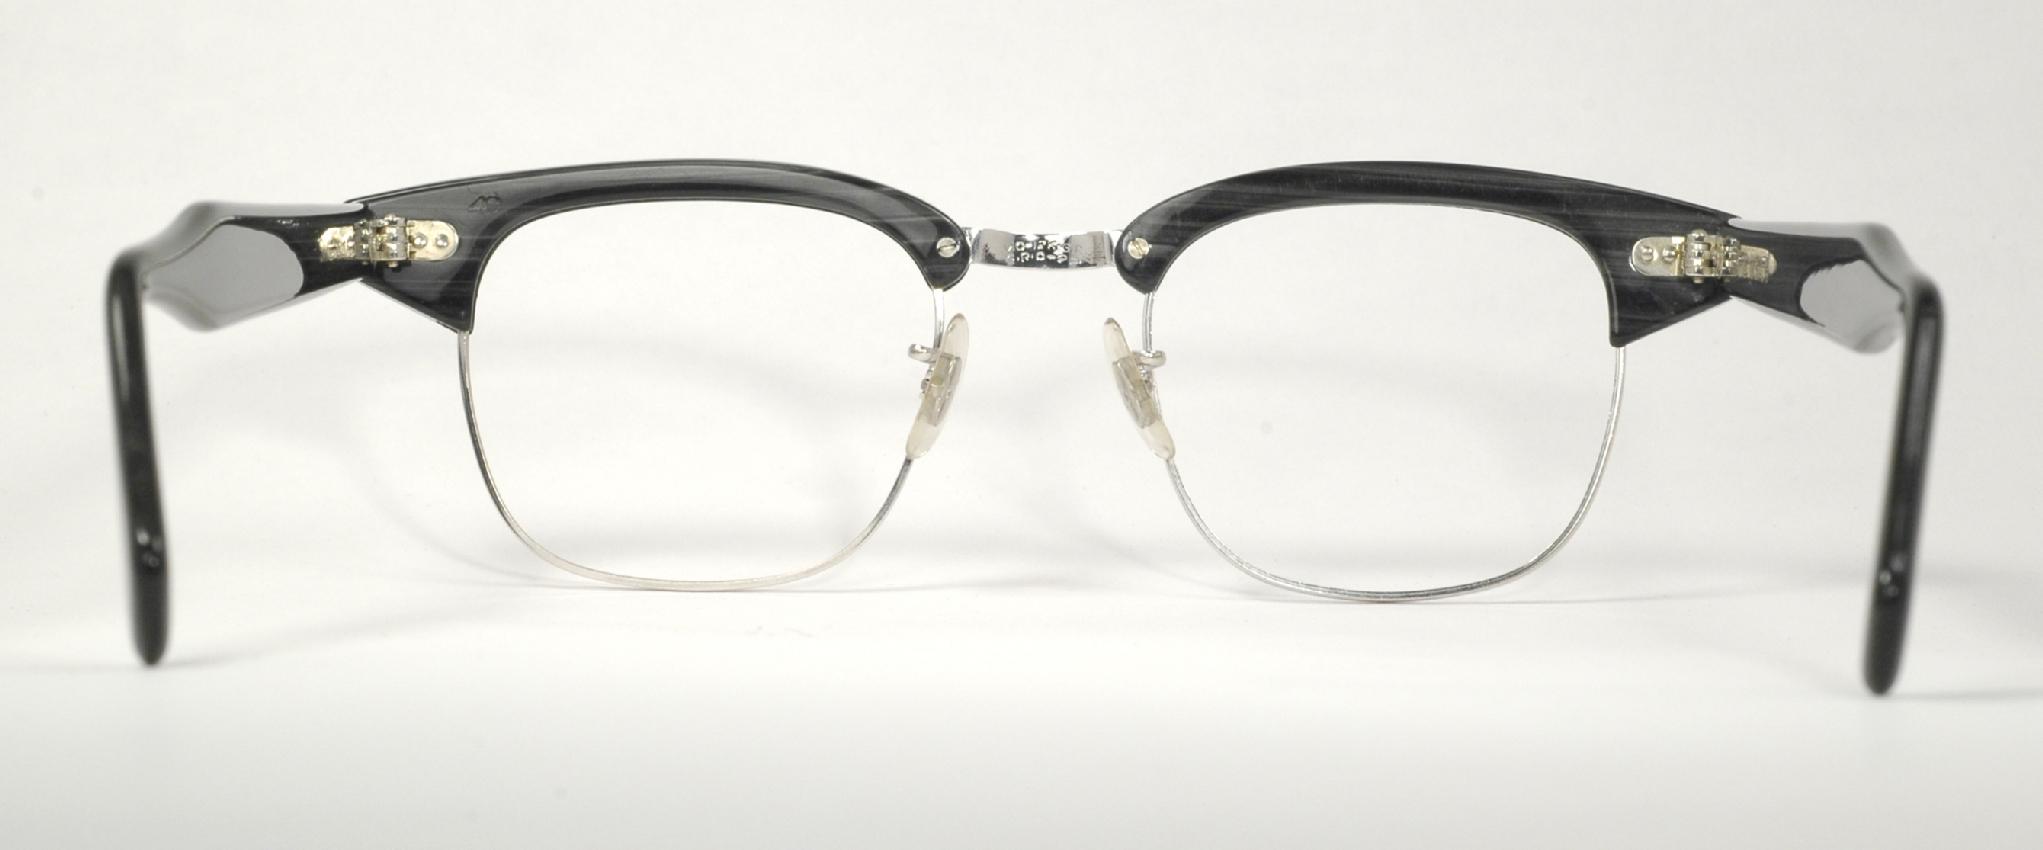 optometrist attic sro g malcolm x vintage black